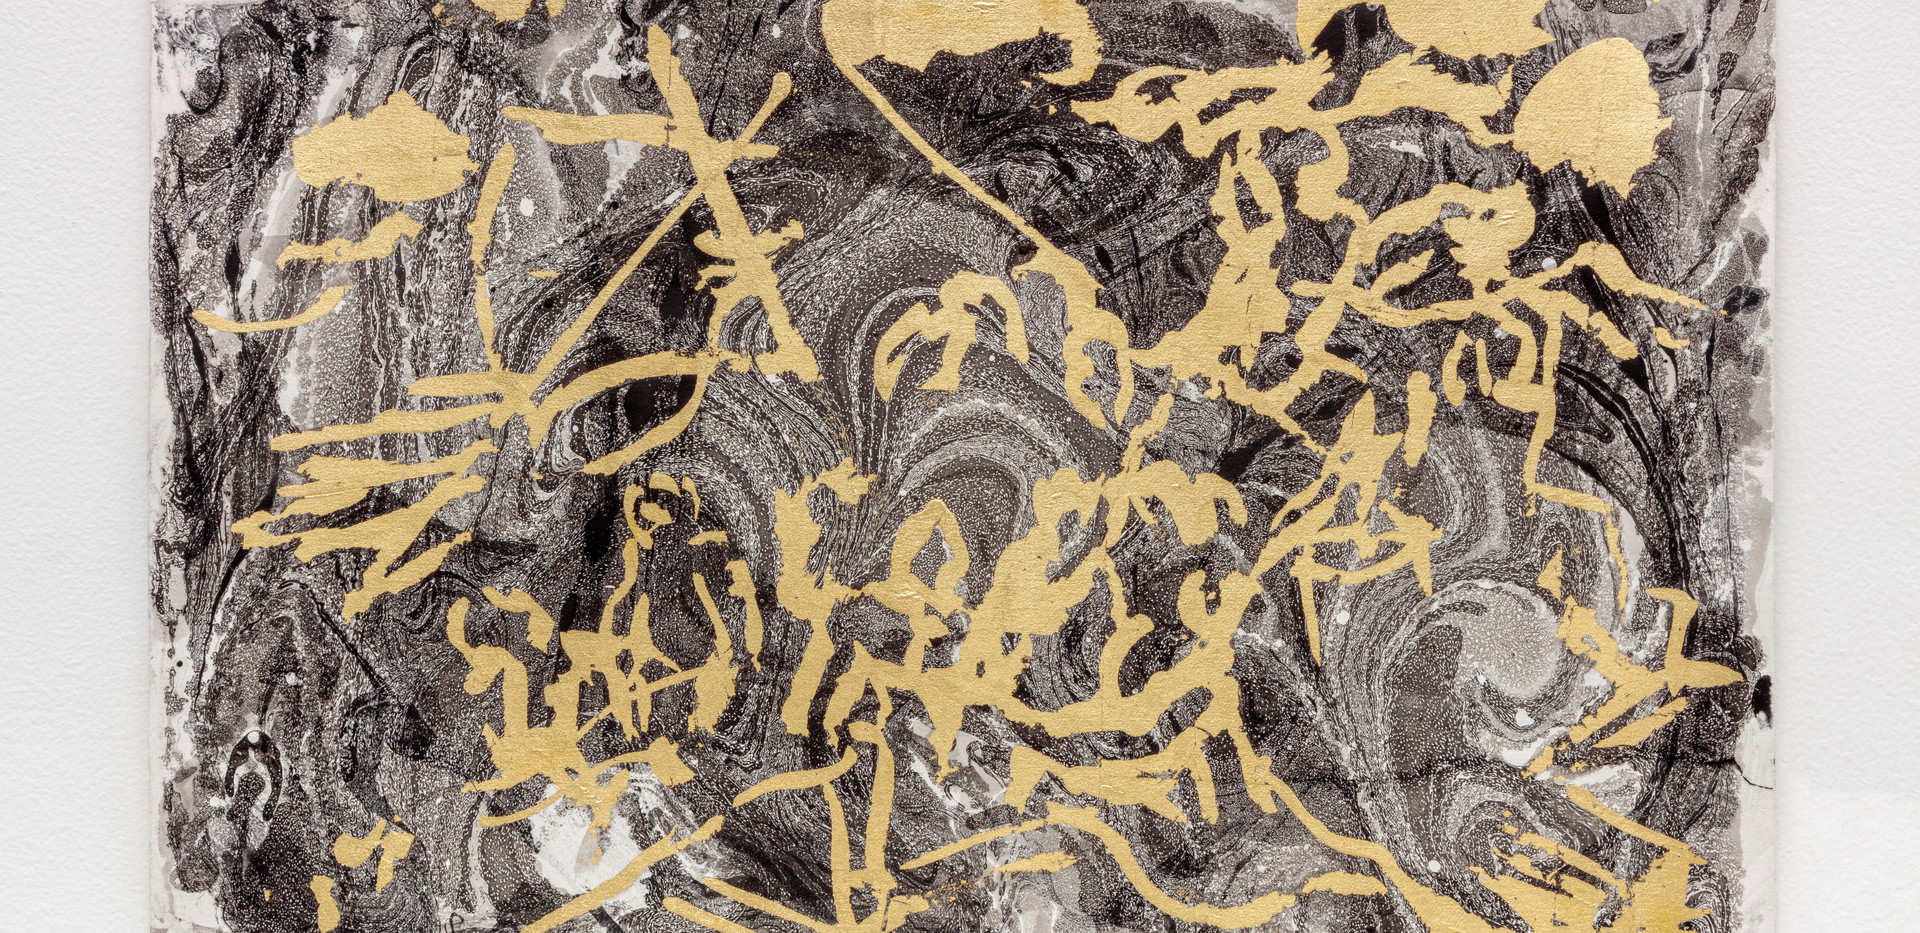 Méduse (Géricault tribute) 2019 Gold foil on marbling rosaspina paper 35,5x50cm